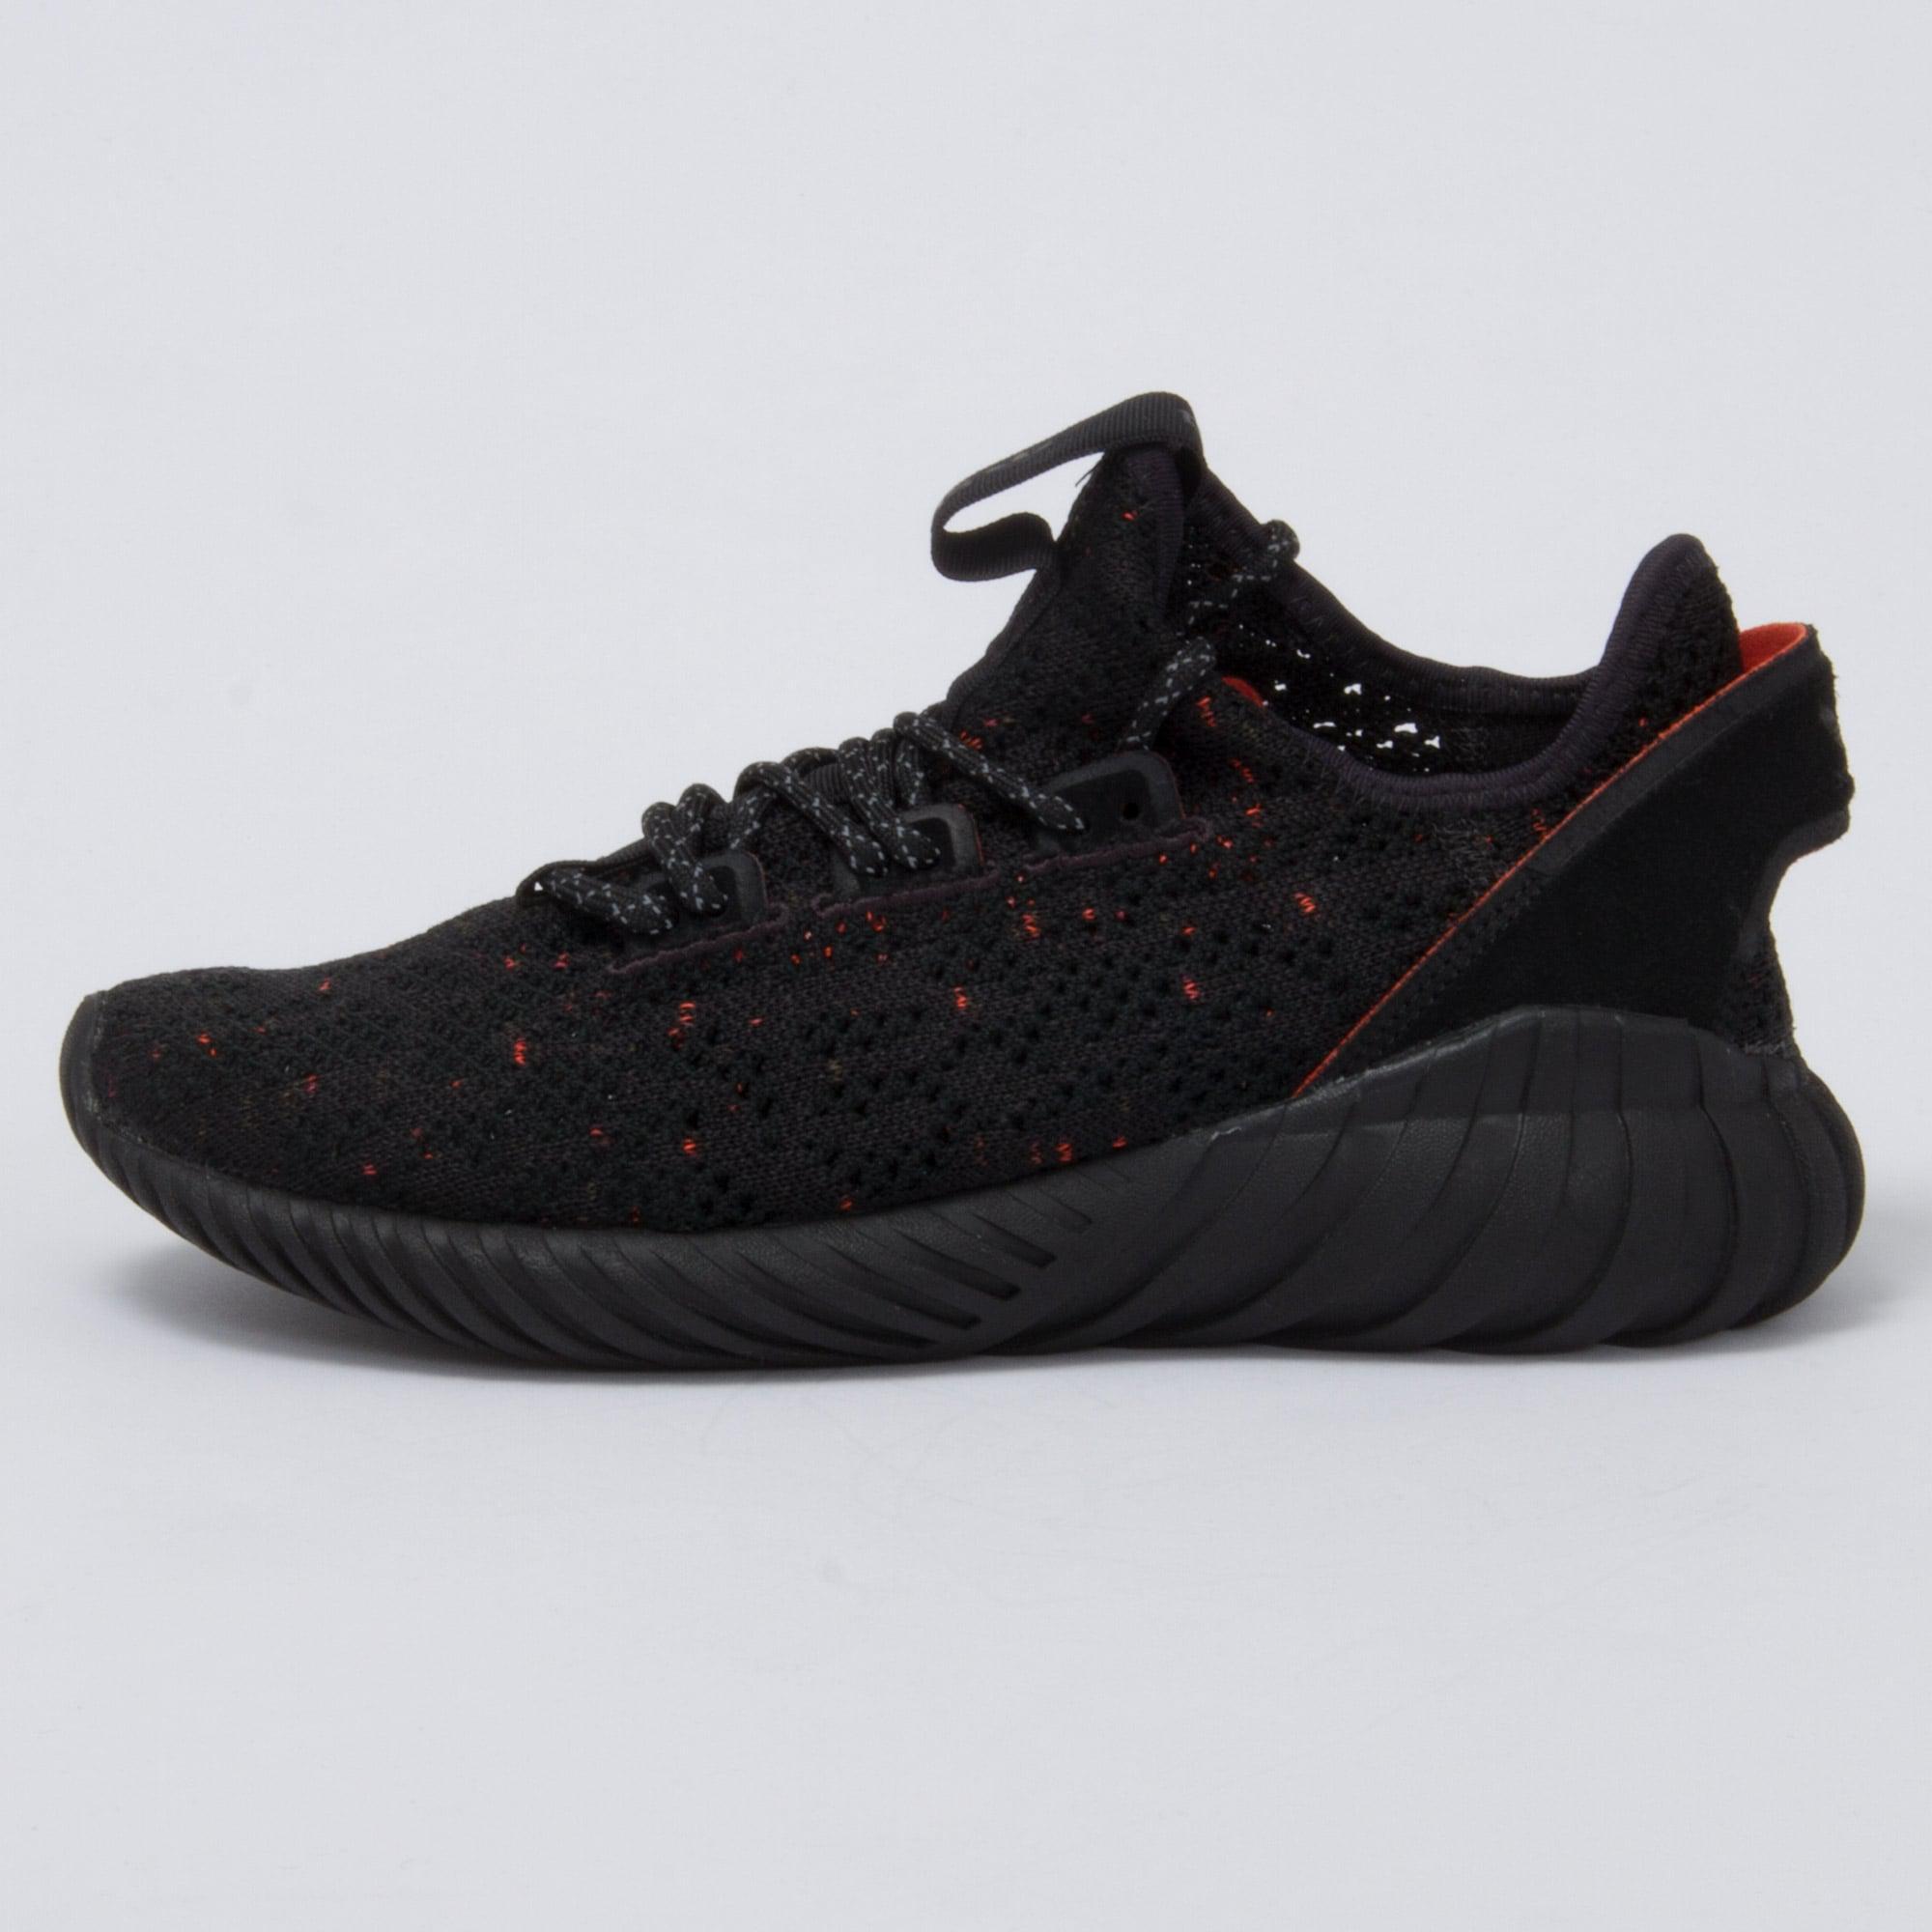 b92d06990735 Lyst - adidas Originals Tubular Doom Sock Primeknit in Black for Men